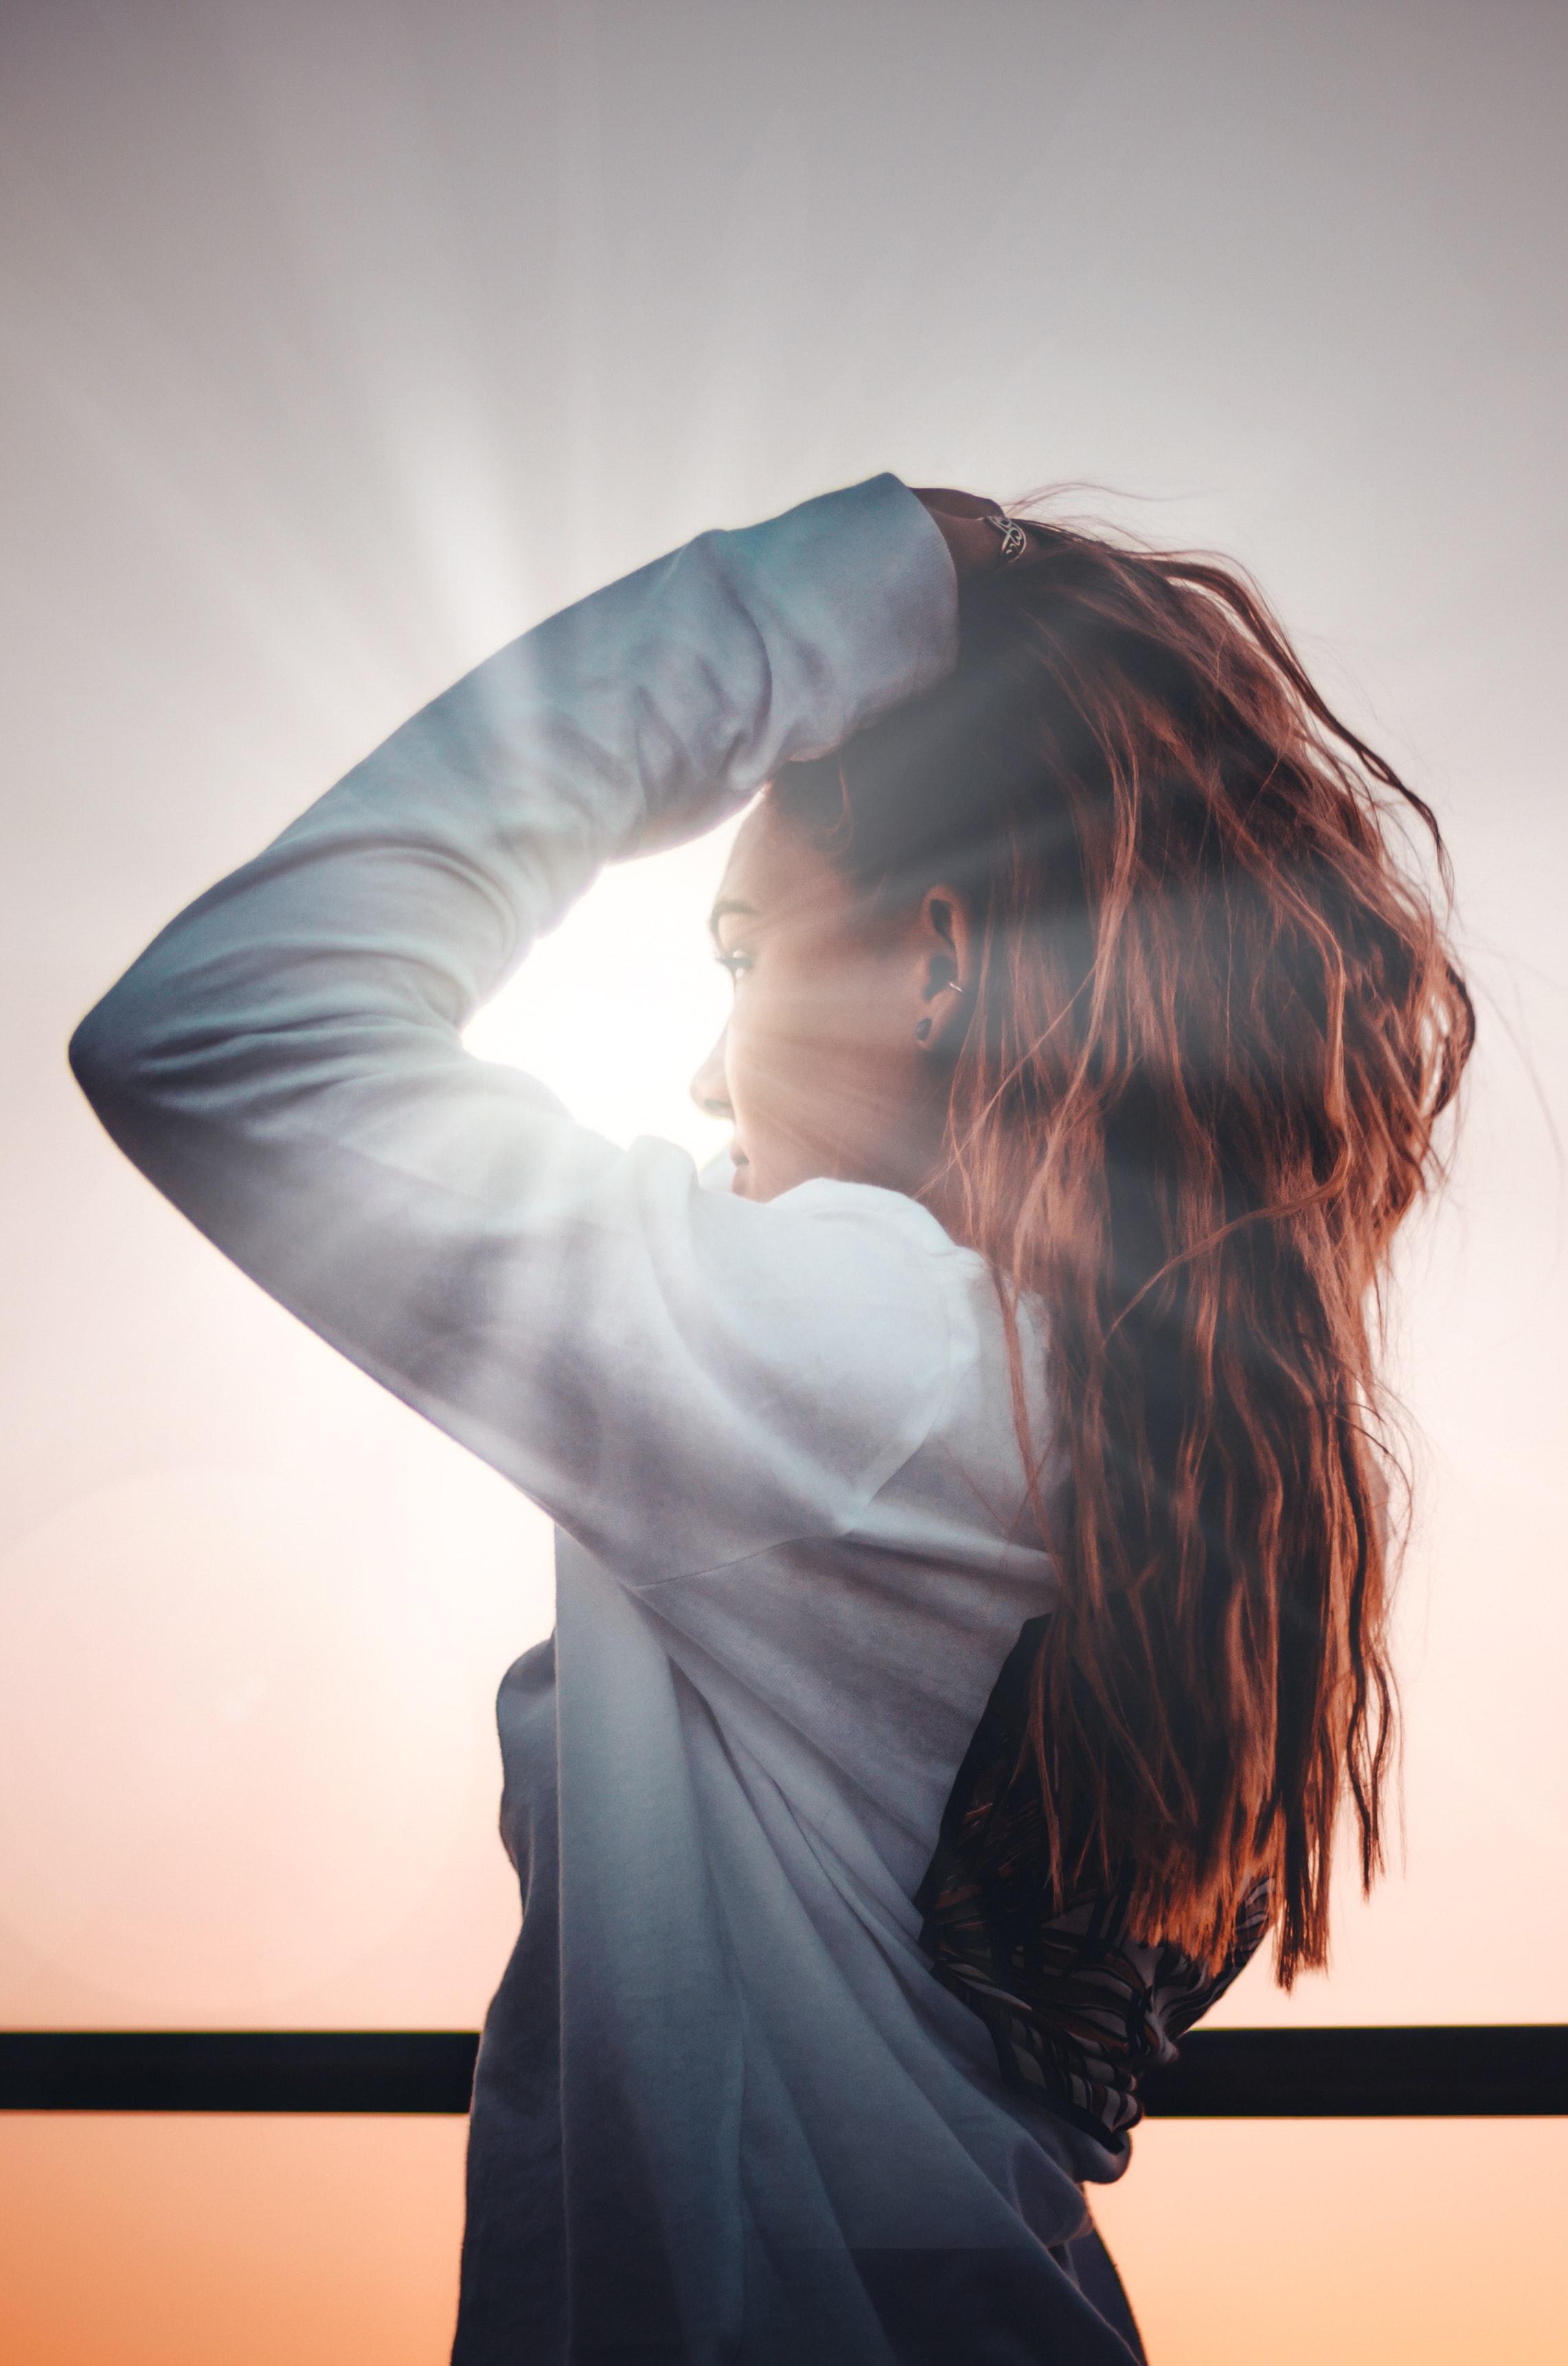 Sun shining on woman.